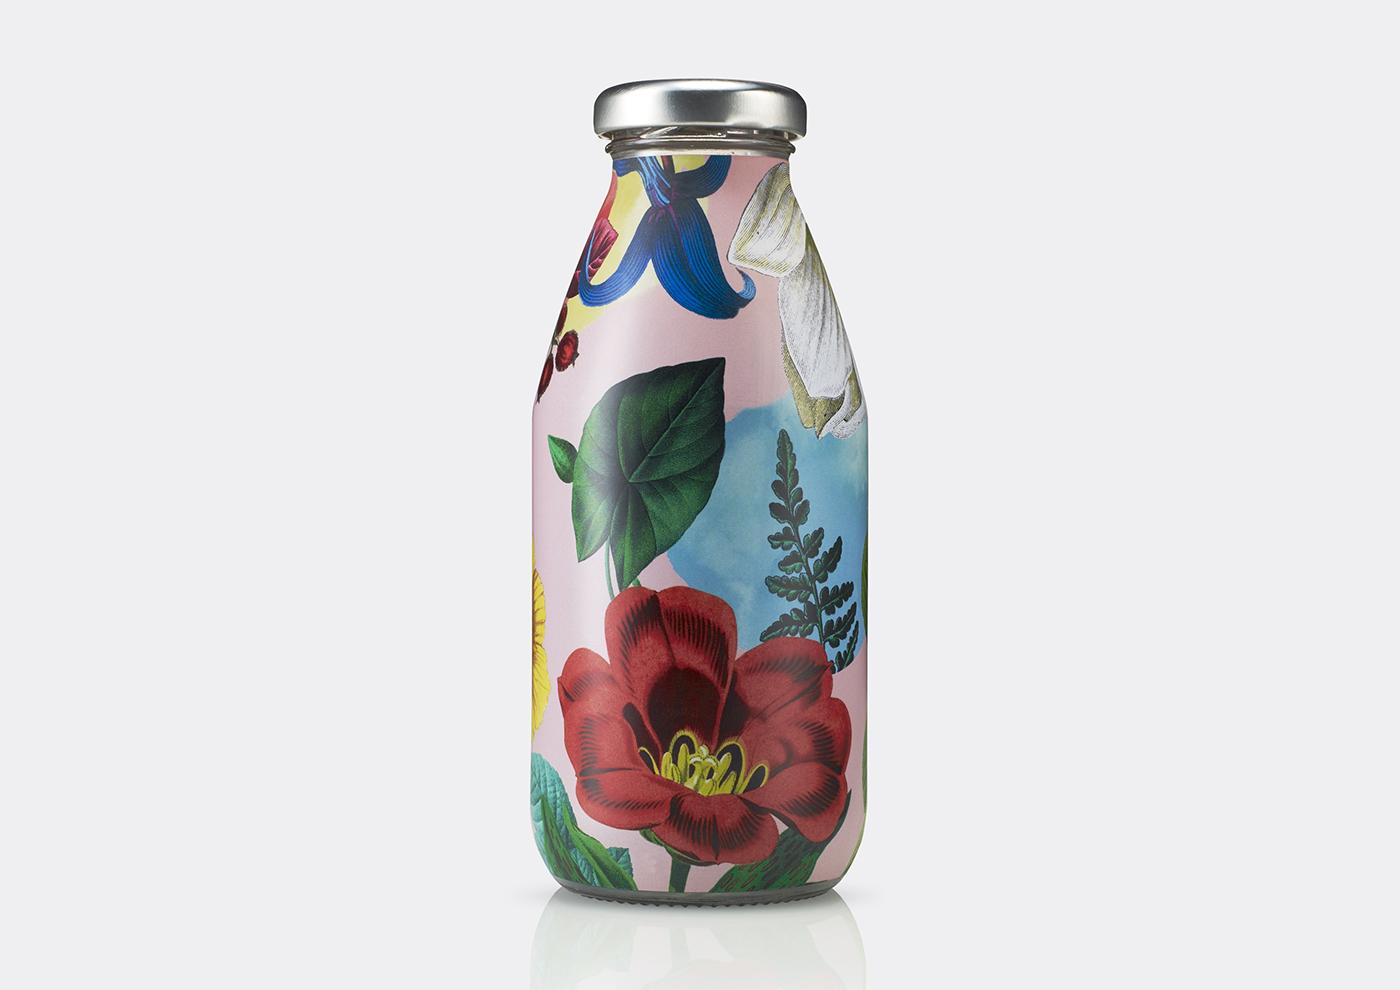 Firefly-packaging-b&b